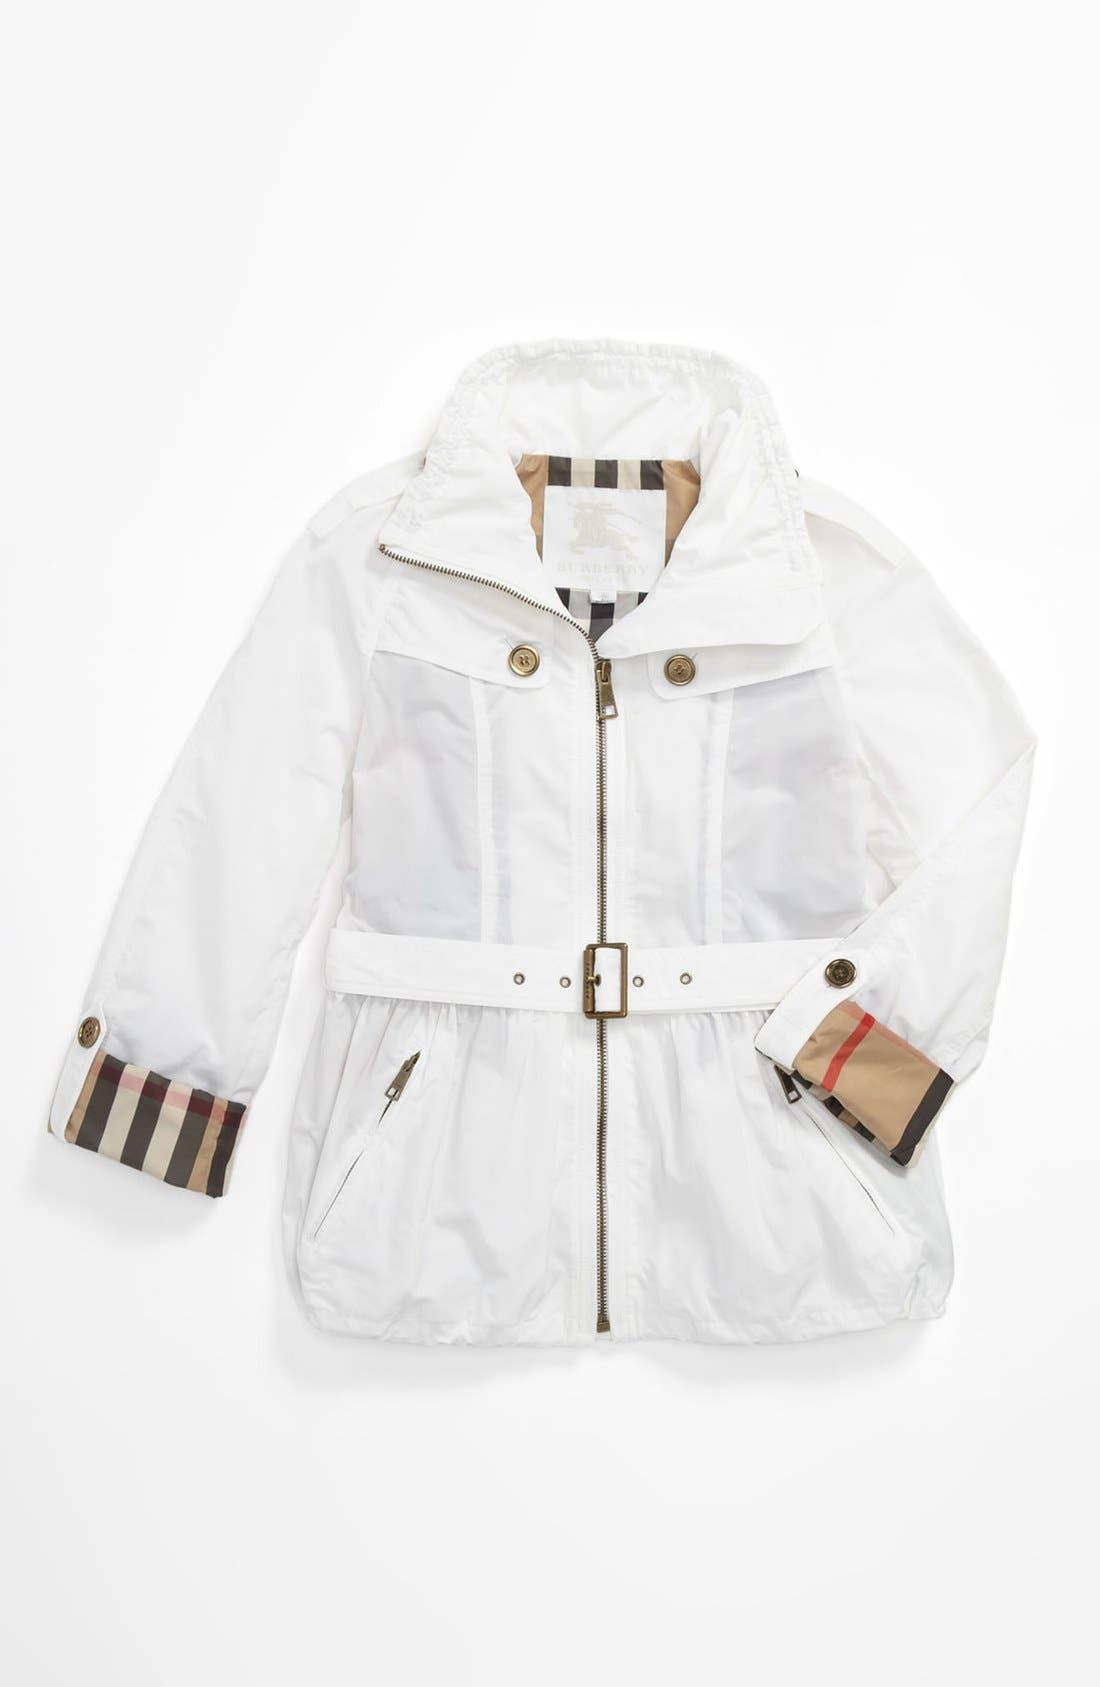 Alternate Image 1 Selected - Burberry 'Maddlebrook' Jacket (Little Girls & Big Girls)